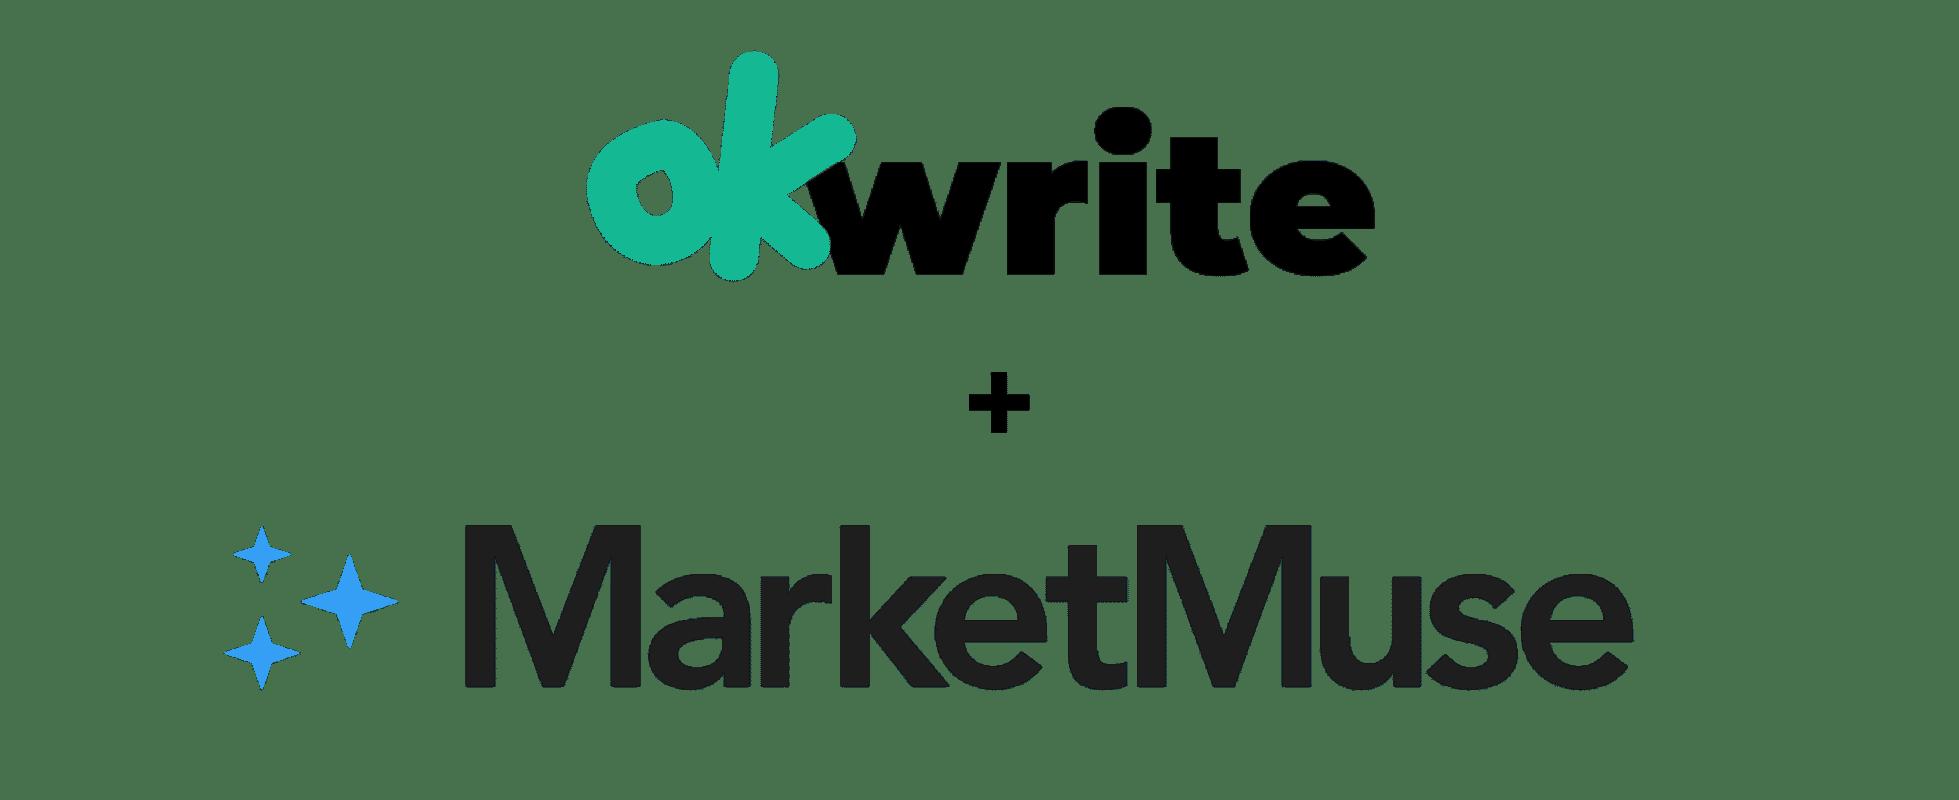 okwrite marketmuse